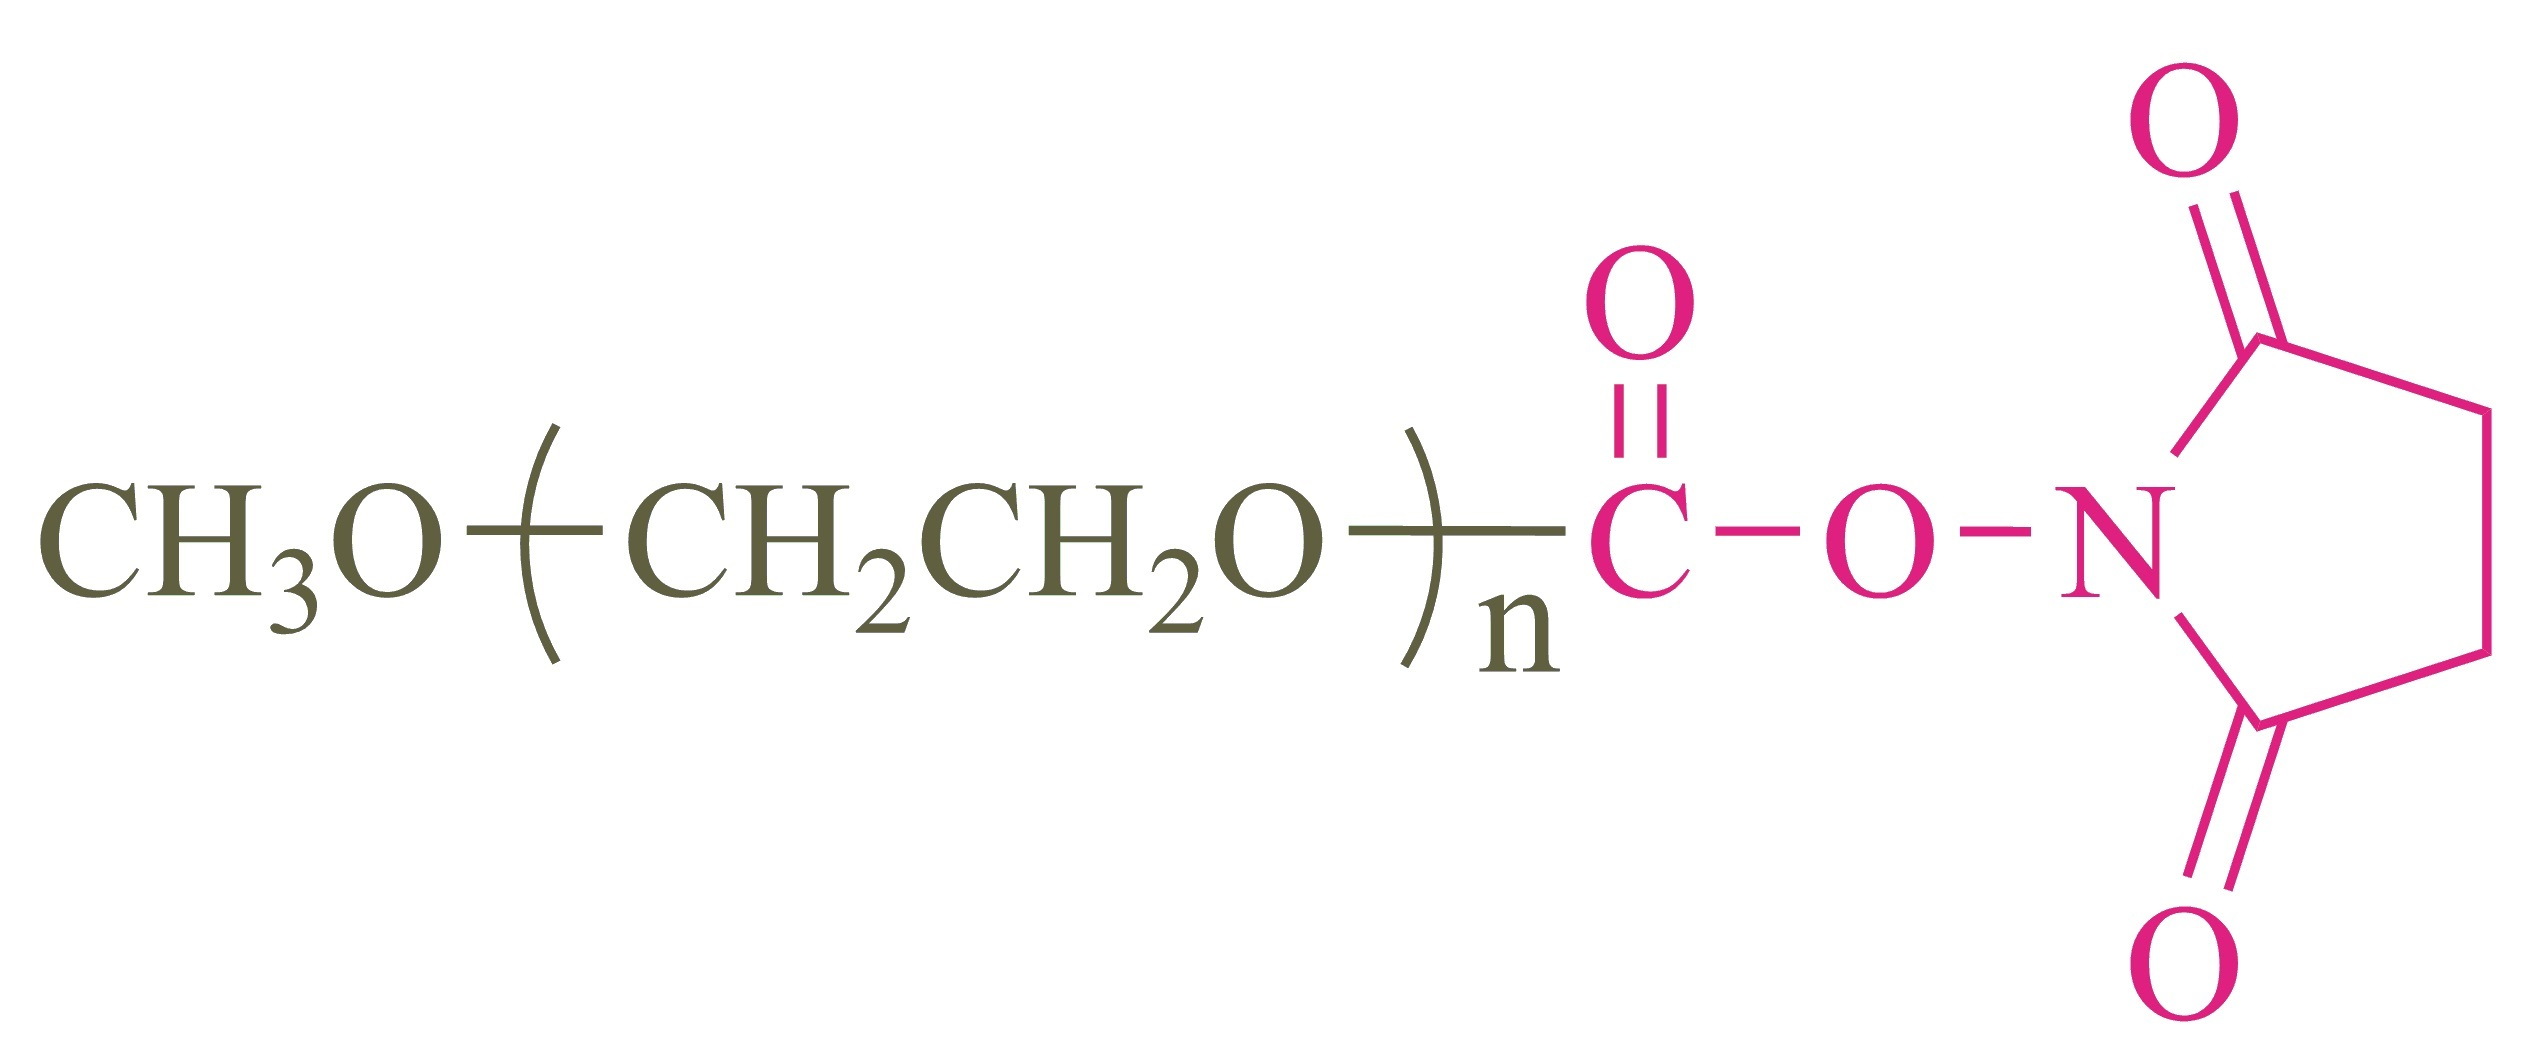 甲氧基聚乙二醇琥珀酰亚胺碳酸酯;Methoxypoly(ethylene glycol) succinimidyl carbonate;(mPEG-SC)